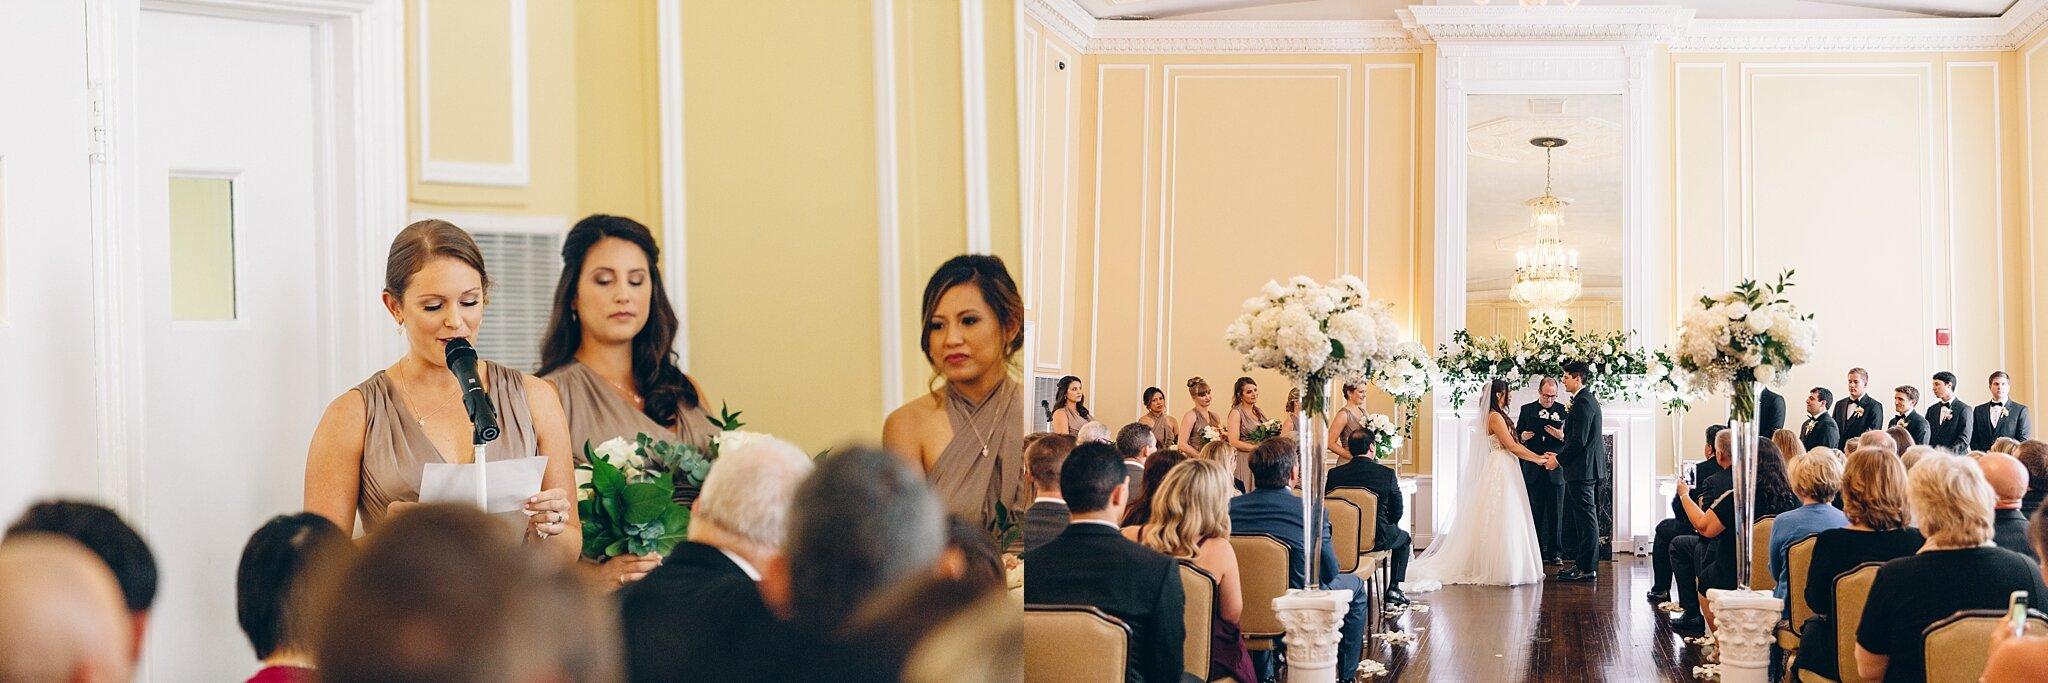 patrick-henry-ballroom-wedding-roanoke_0494.jpg